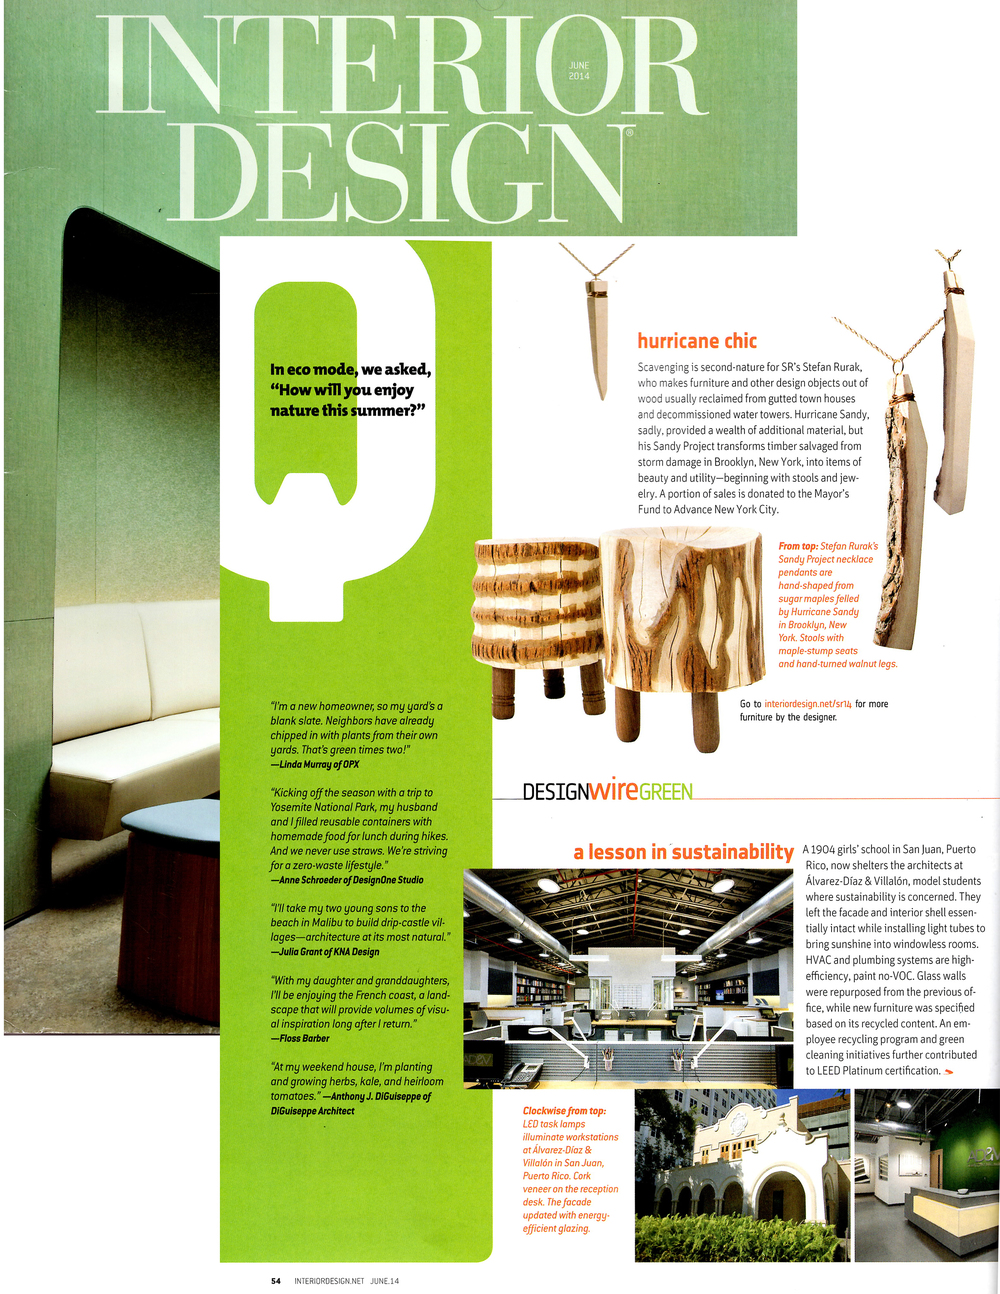 Interior Design Hurricane Chic.jpg